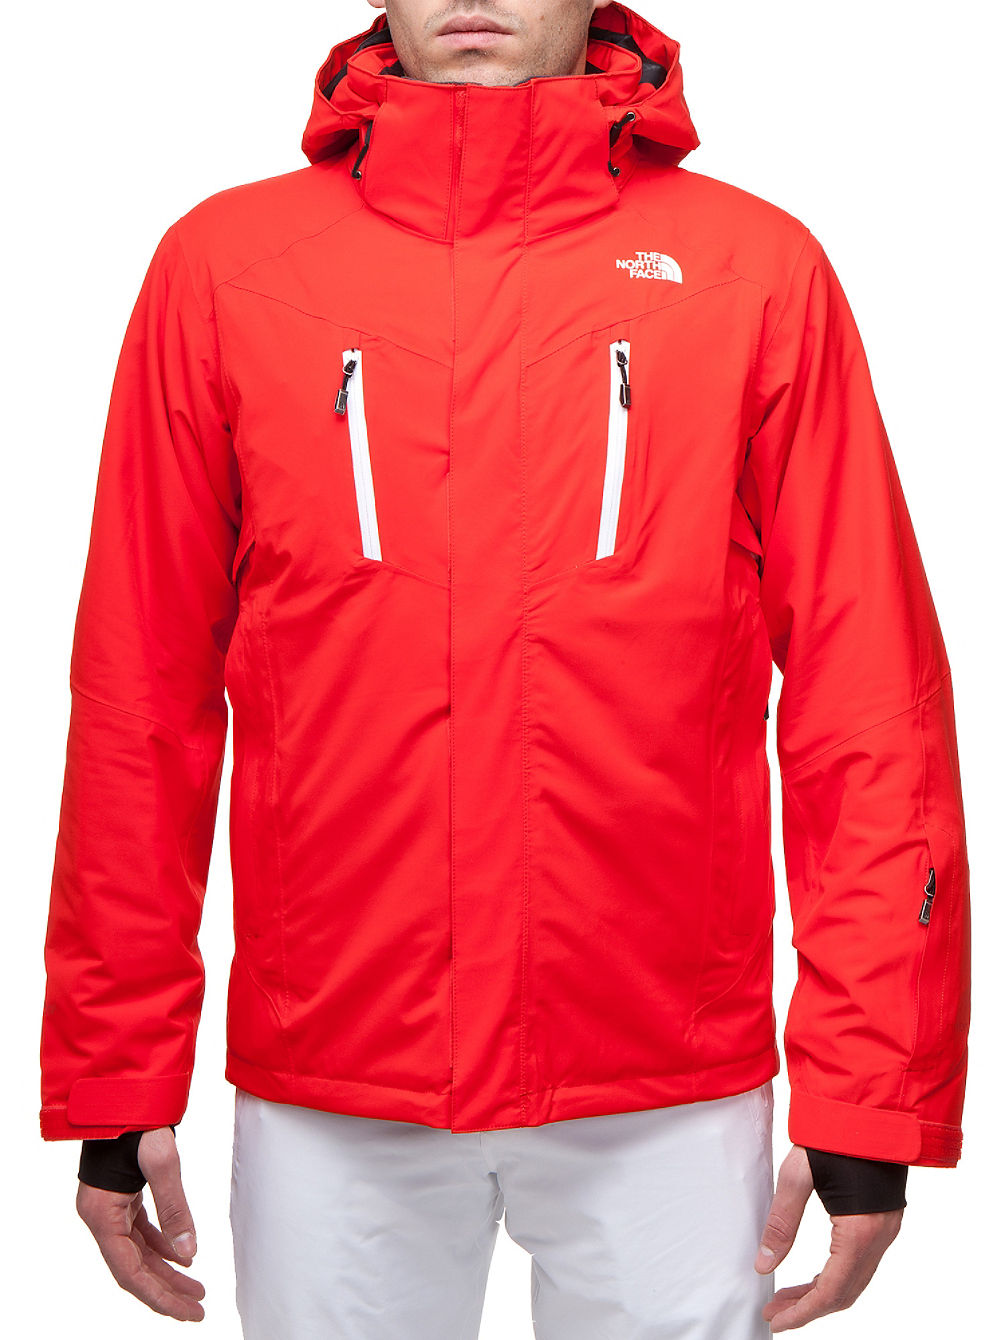 Buy THE NORTH FACE Bansko Jacket online at blue-tomato.com c8b3420b6